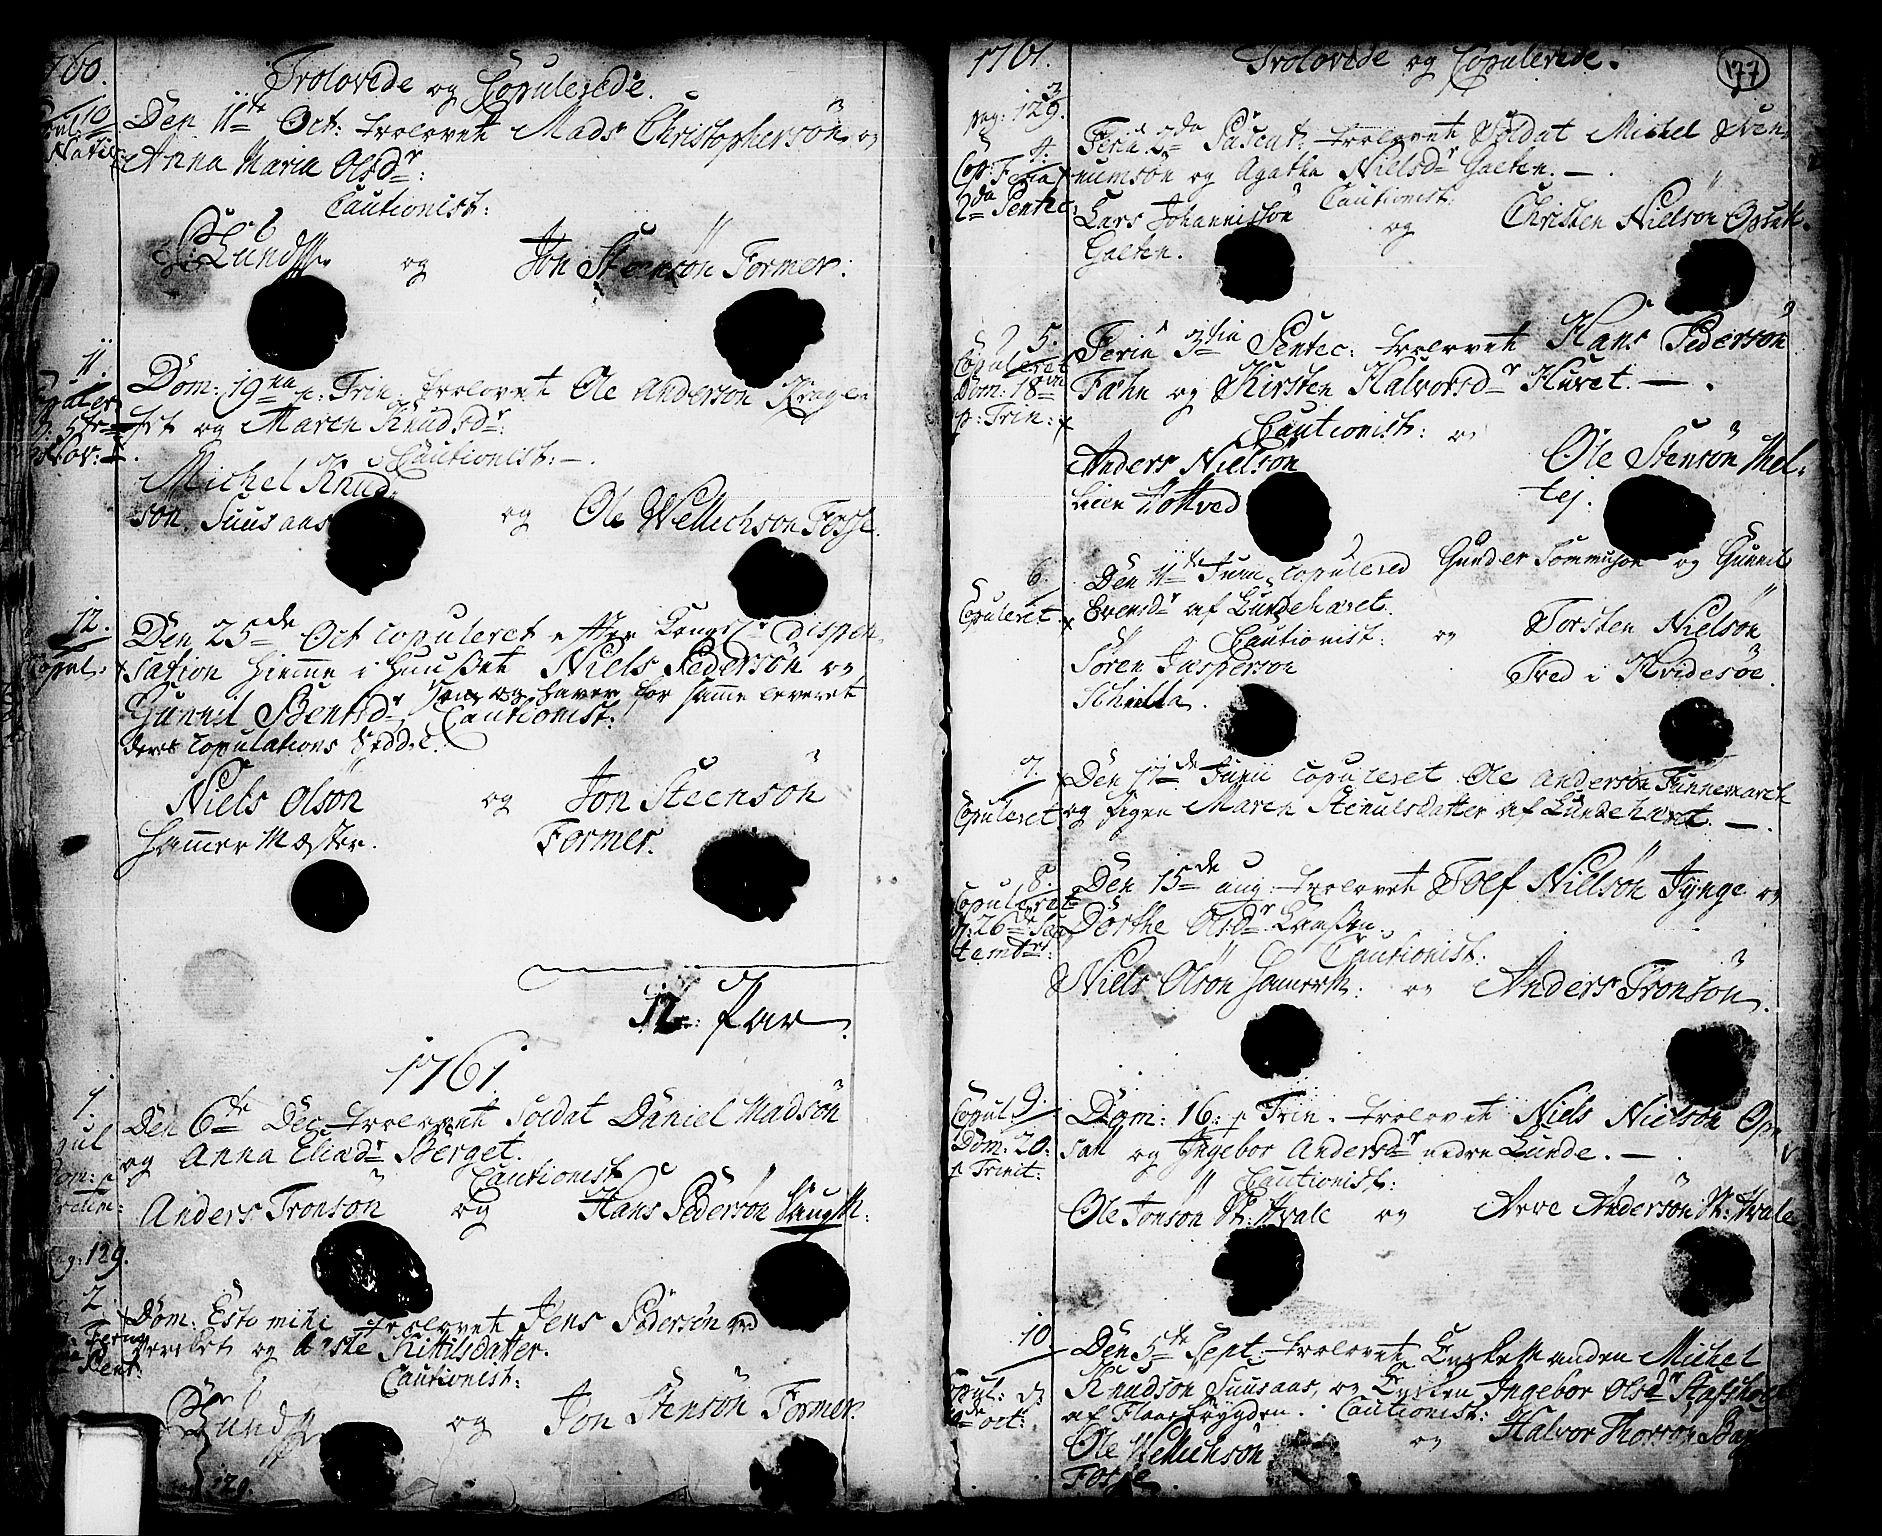 SAKO, Holla kirkebøker, F/Fa/L0001: Ministerialbok nr. 1, 1717-1779, s. 177